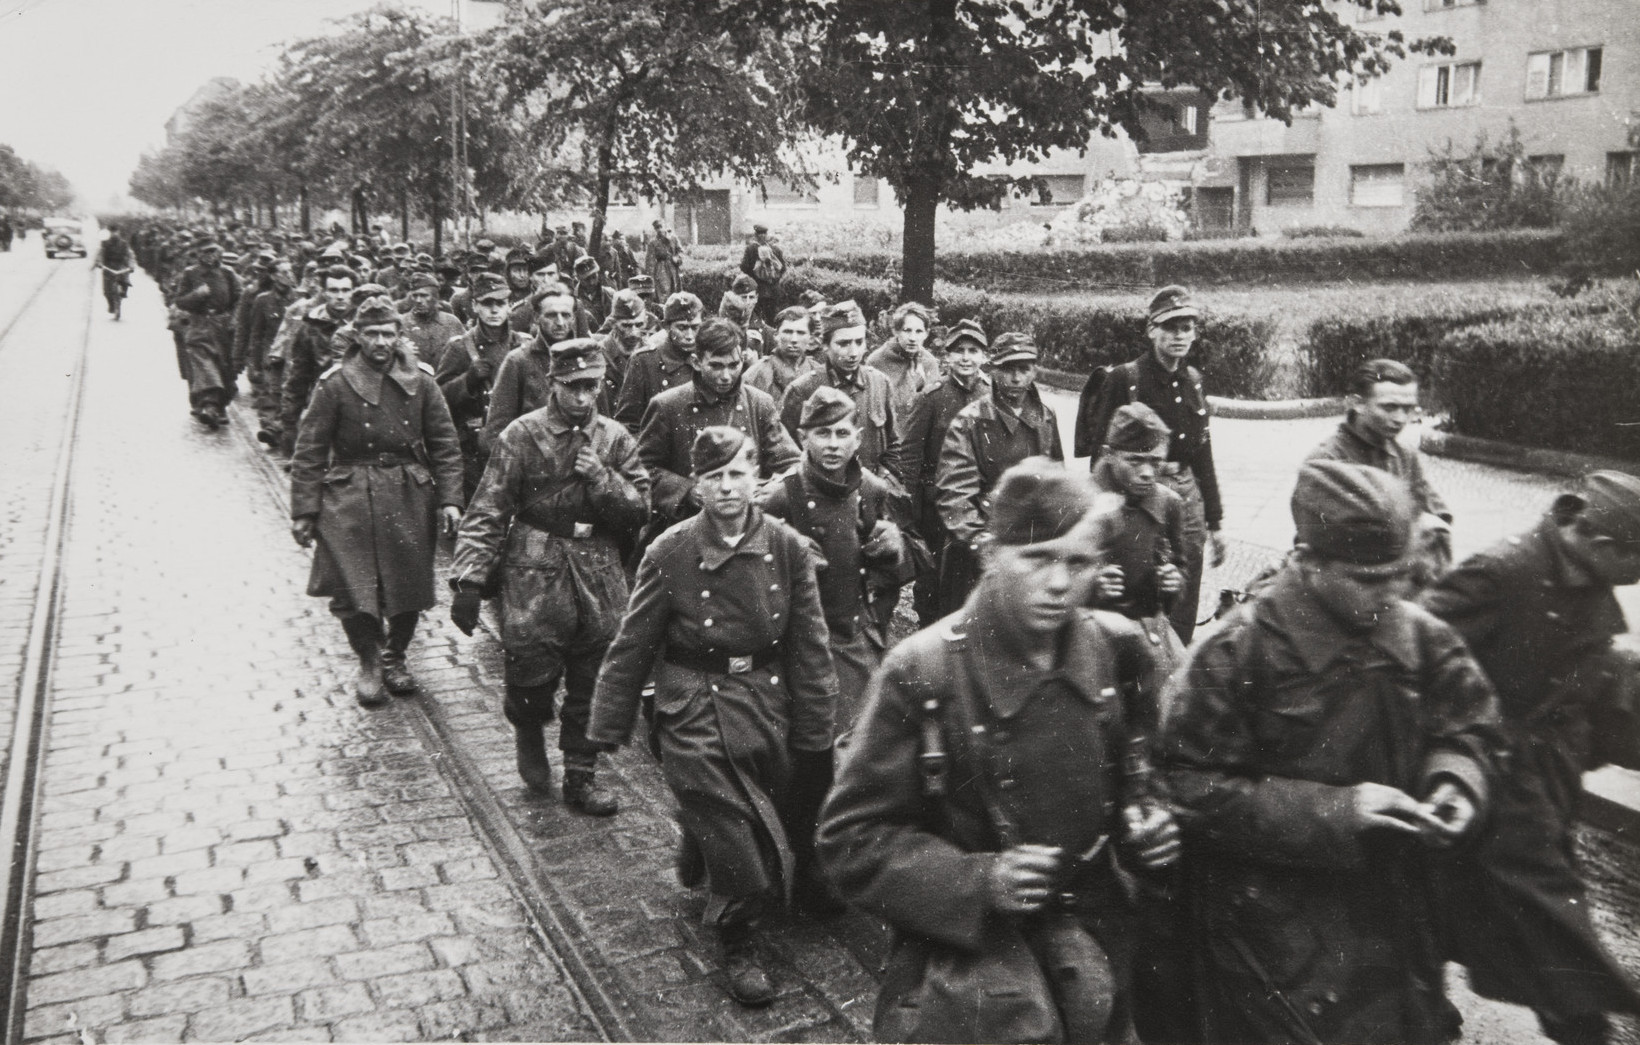 Е. А. Халдей.    Колонна пленных   Берлин, Германия, 1945